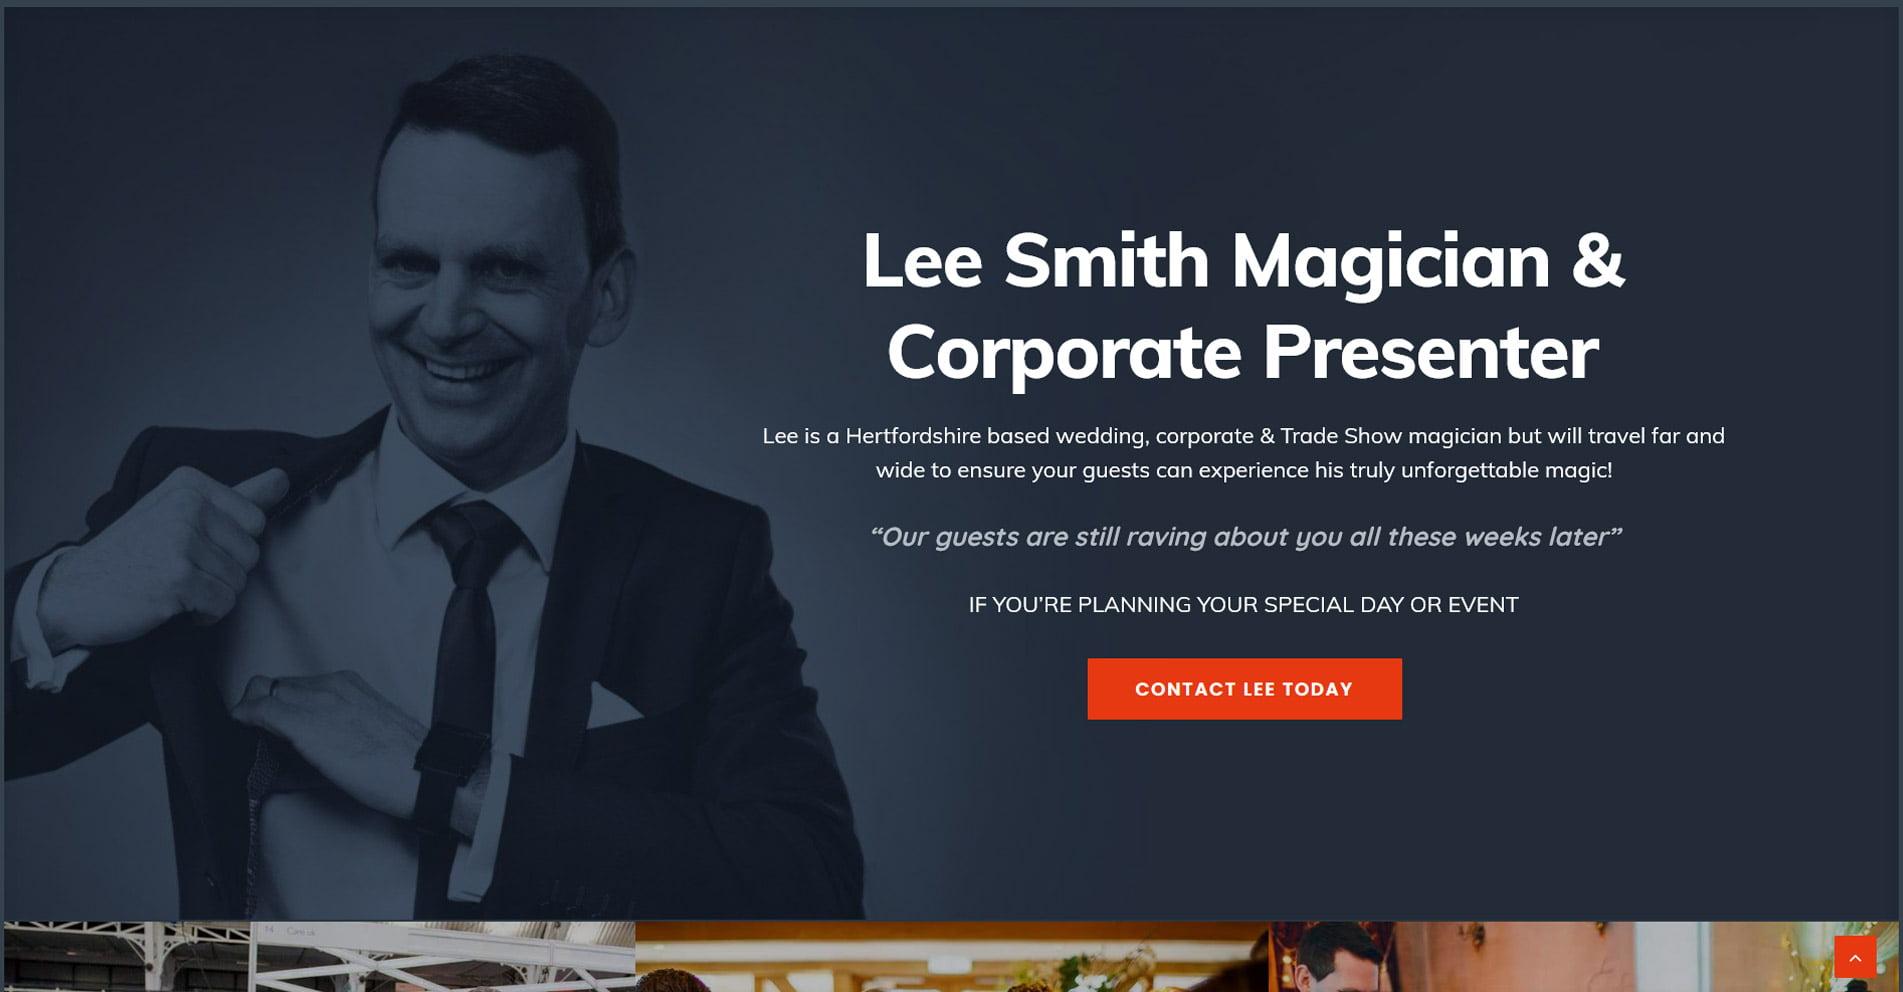 Lee Smith Magic